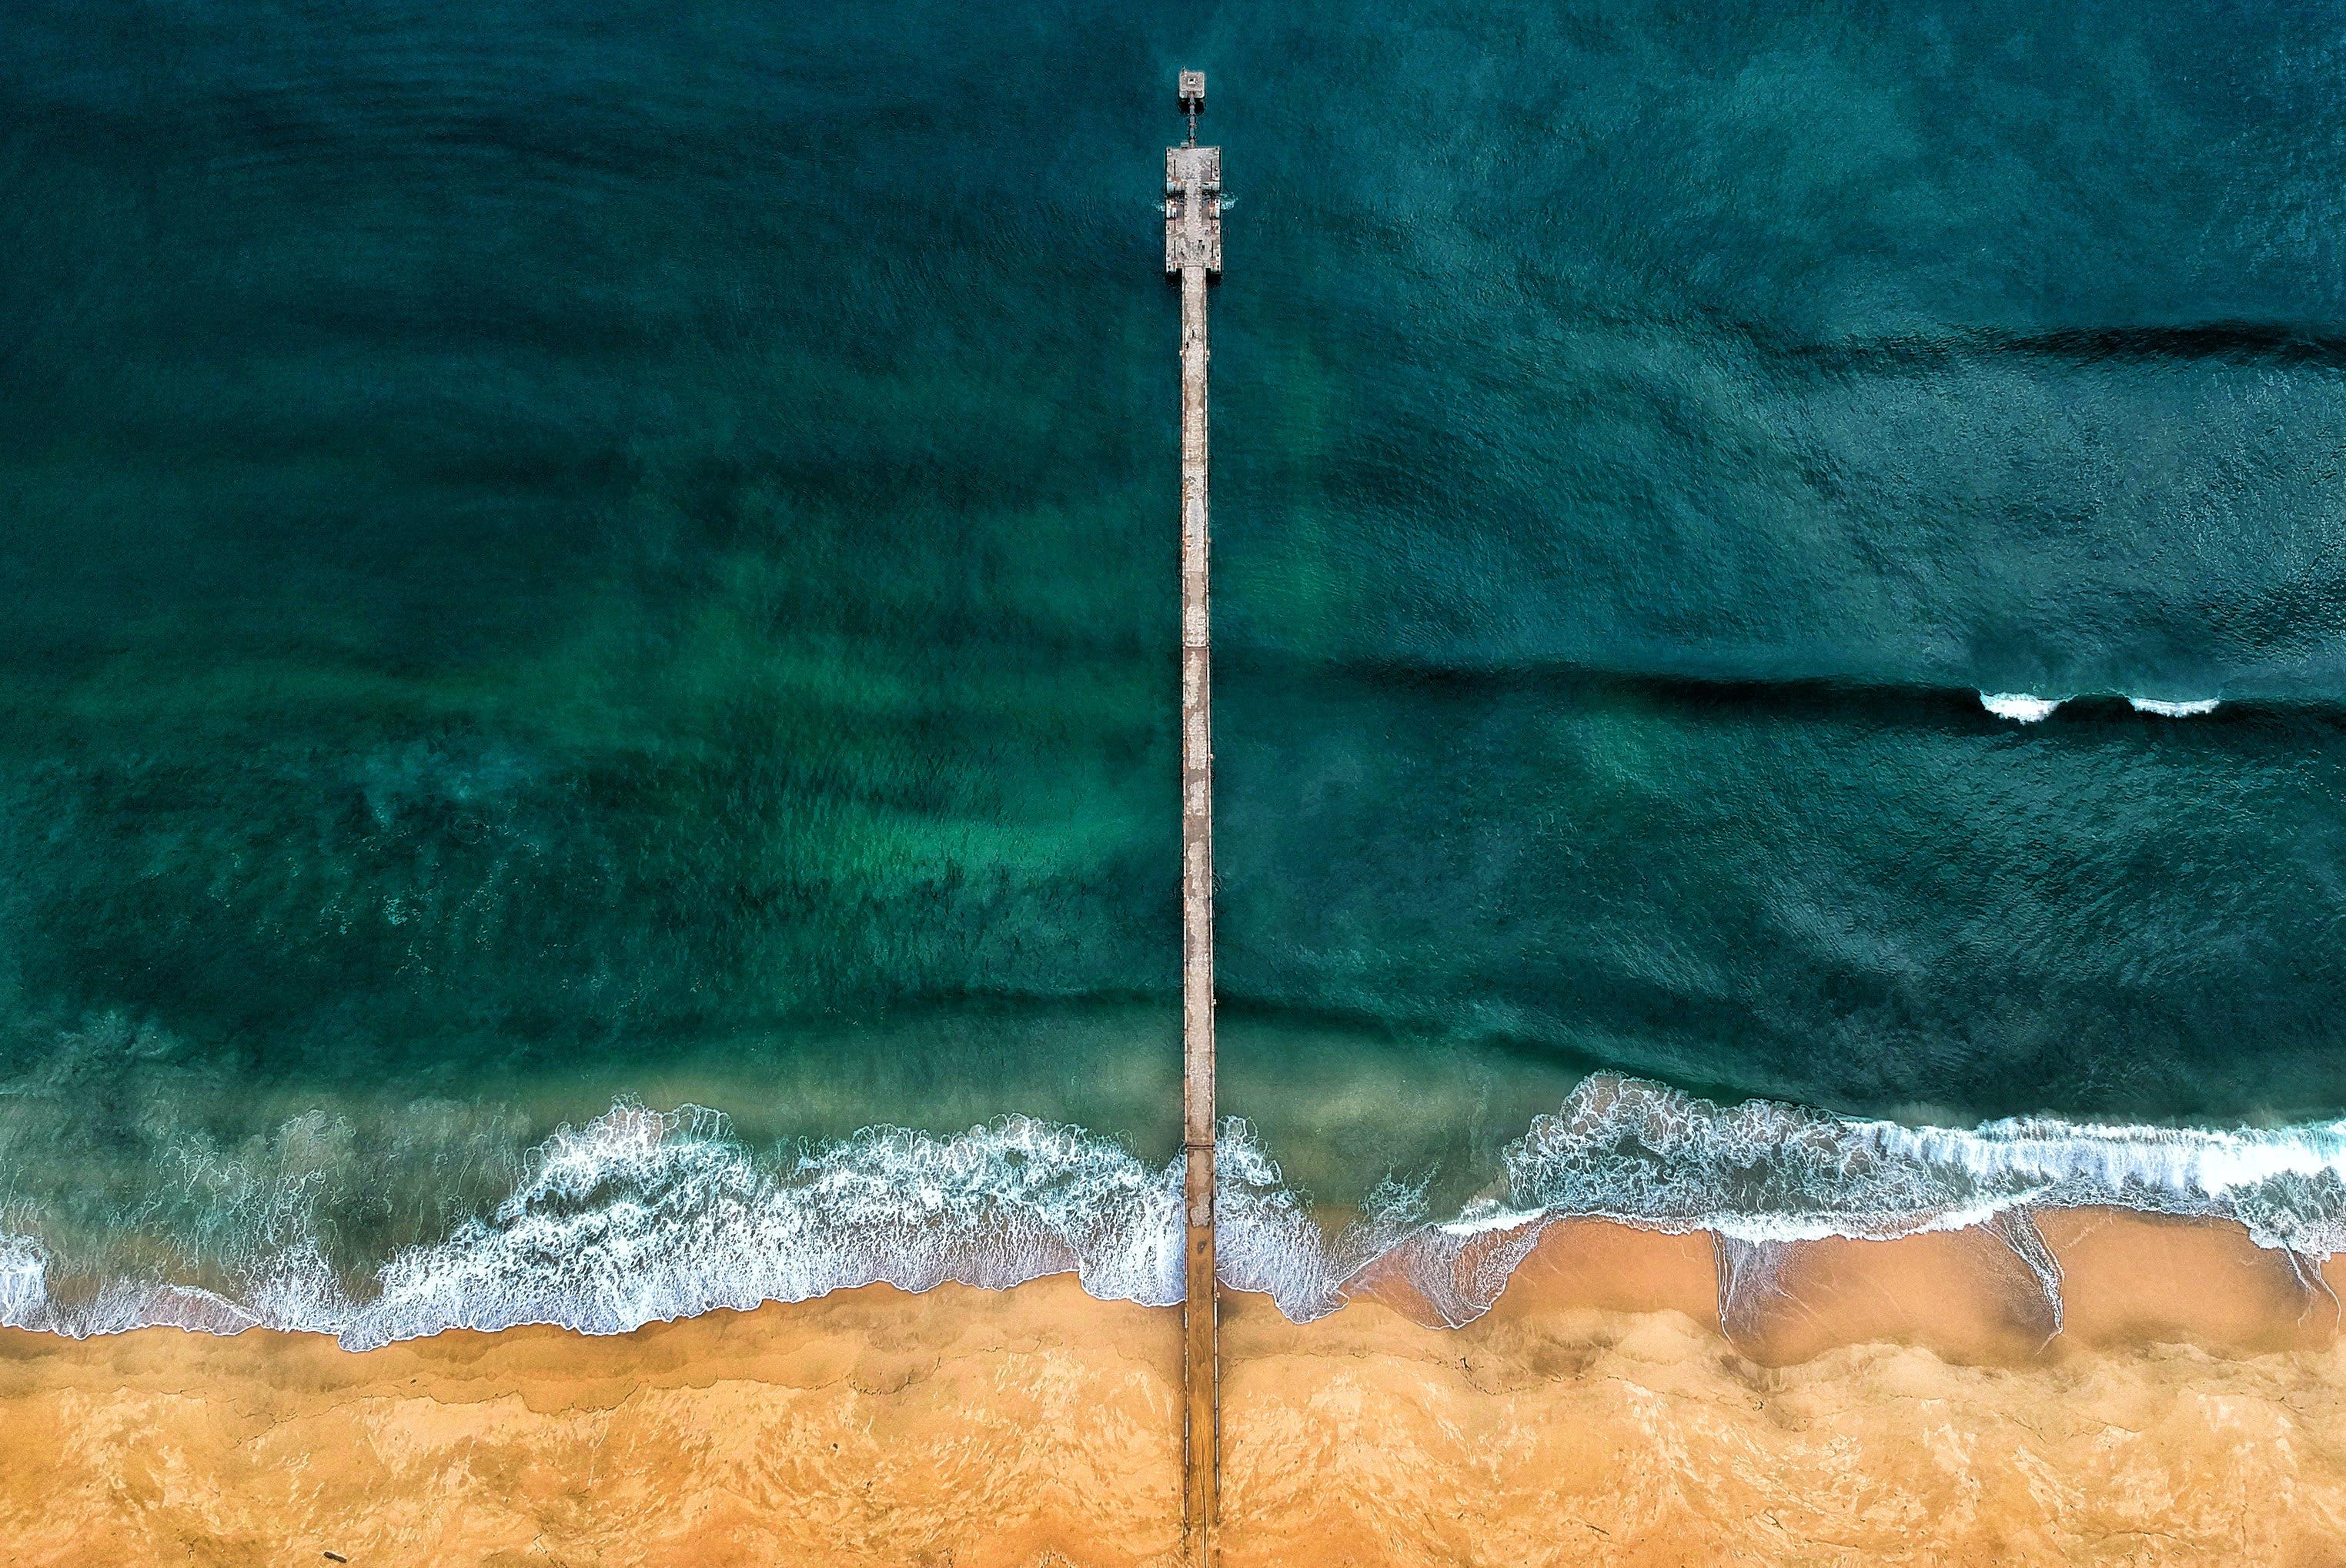 Kostenloses Stock Foto zu anlegesteg, dock, farben, landschaft